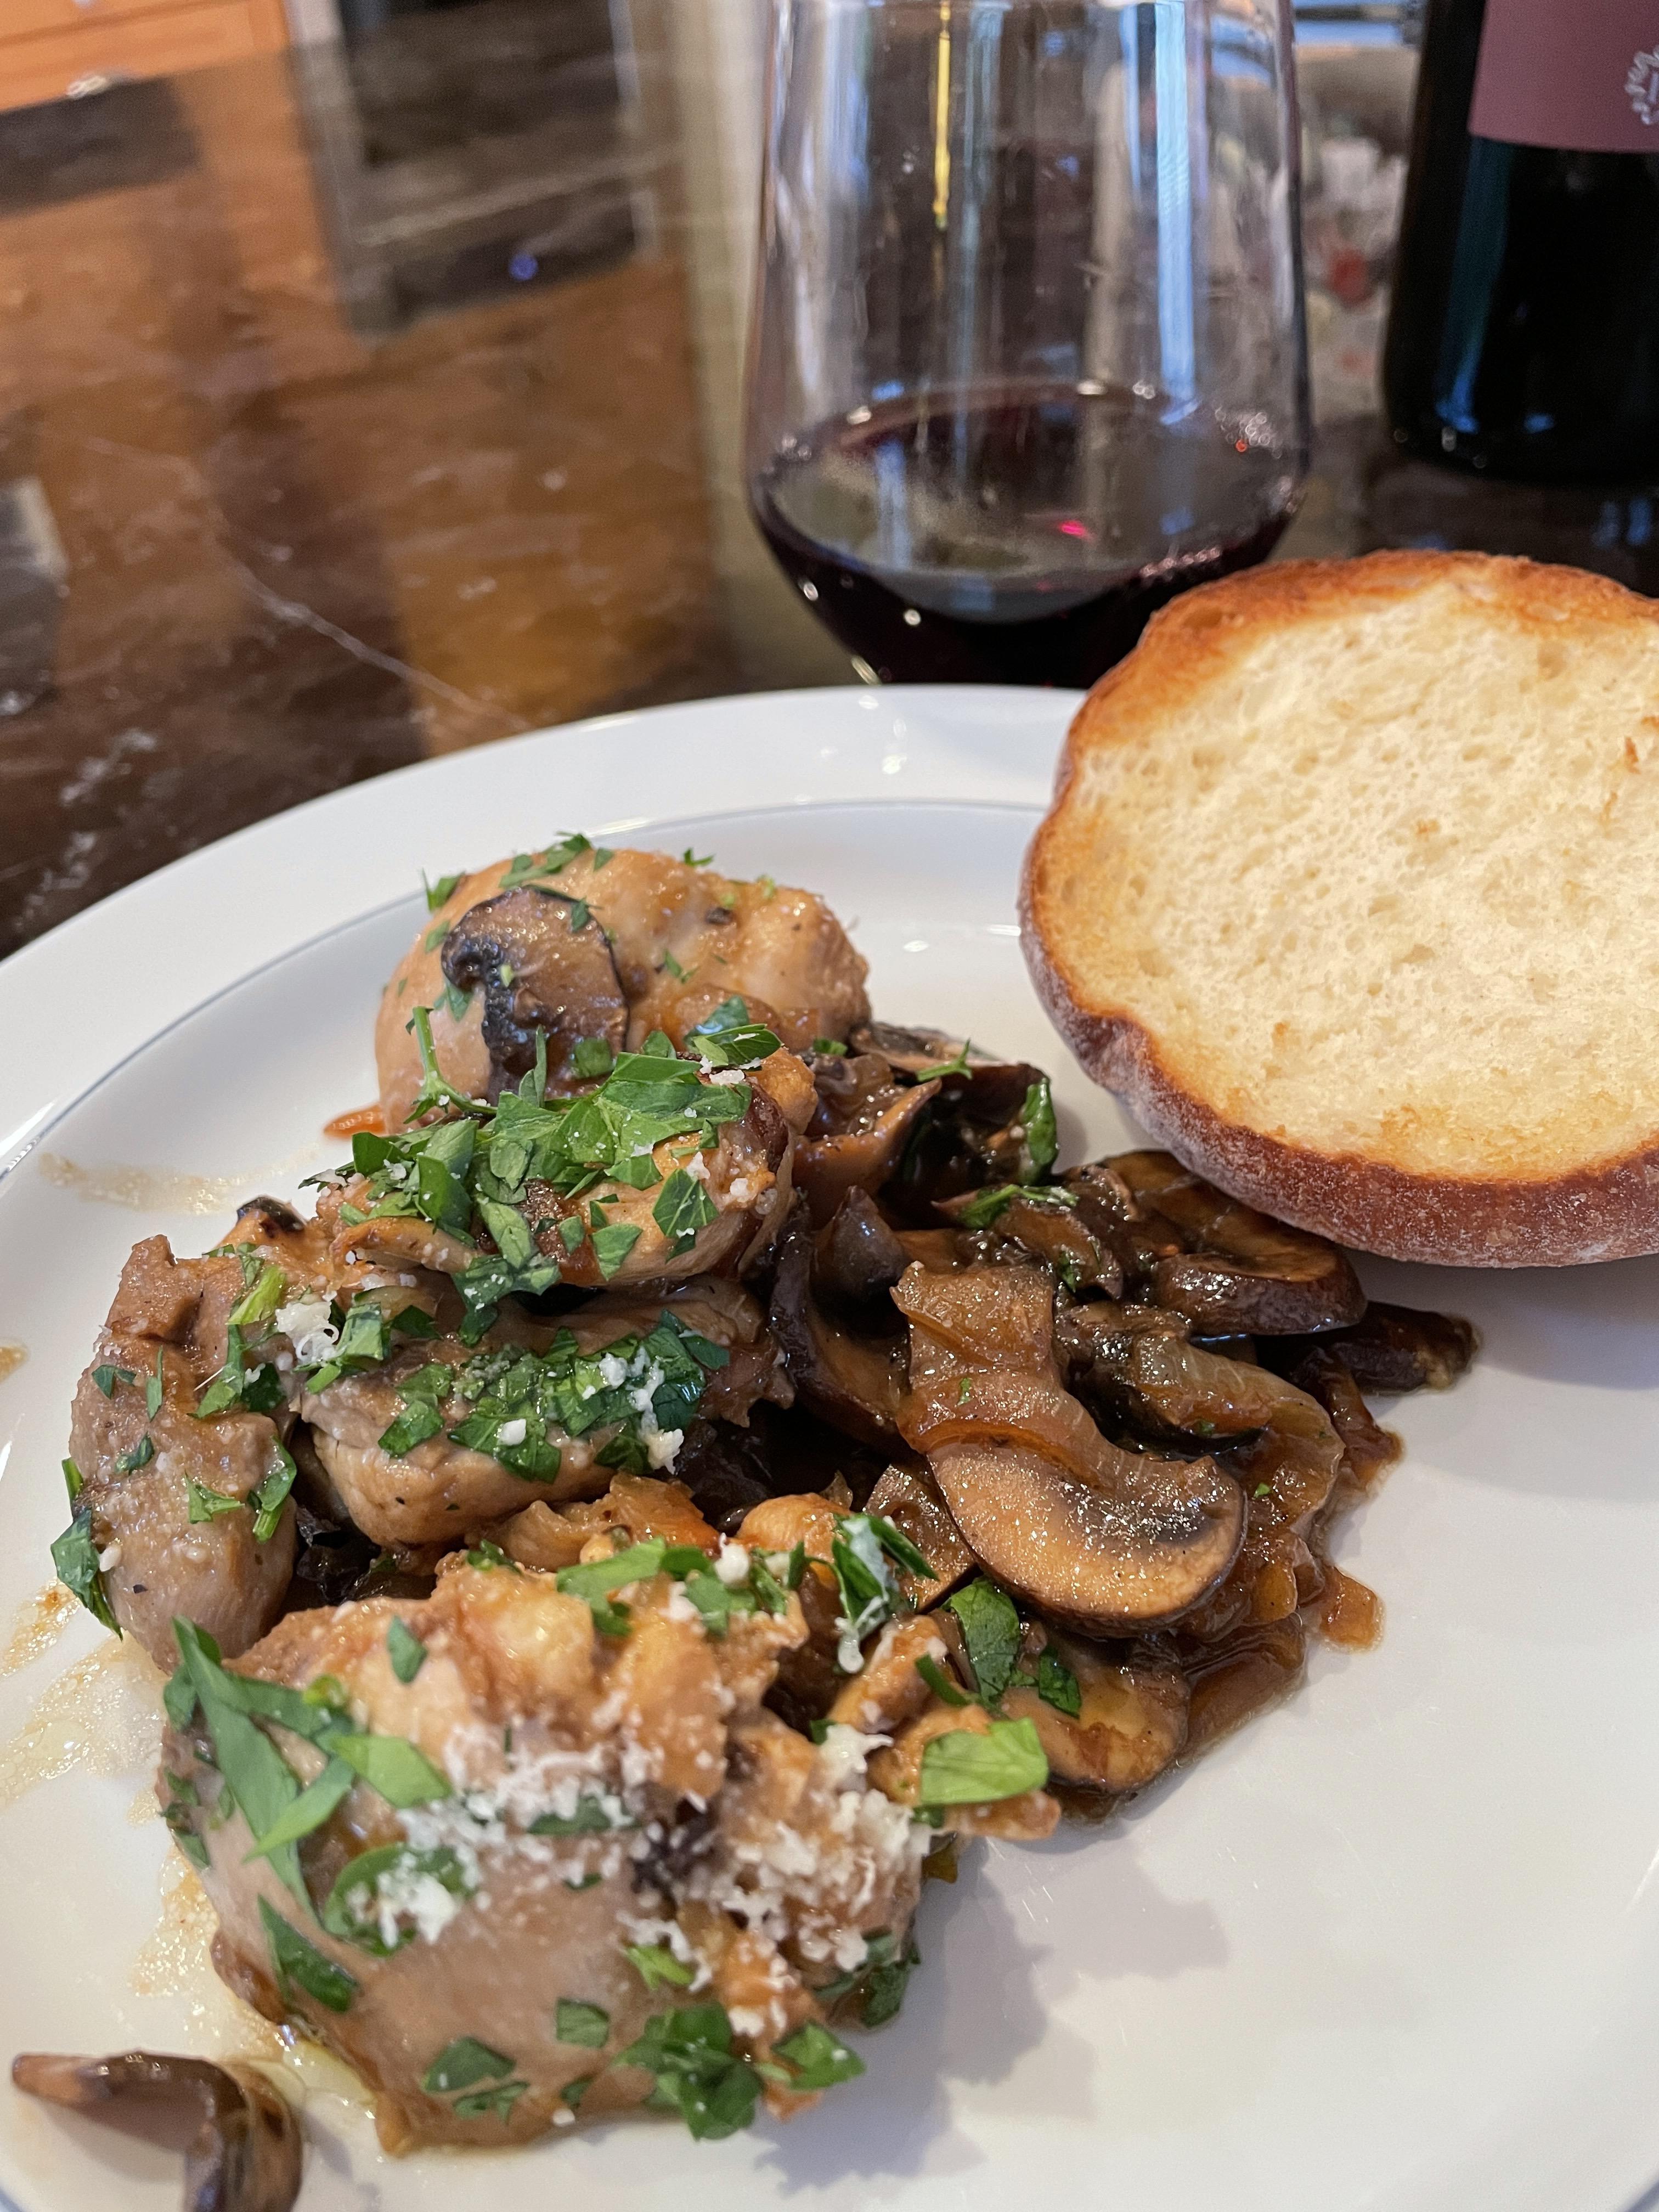 Skillet Chicken, Mushrooms and Onions